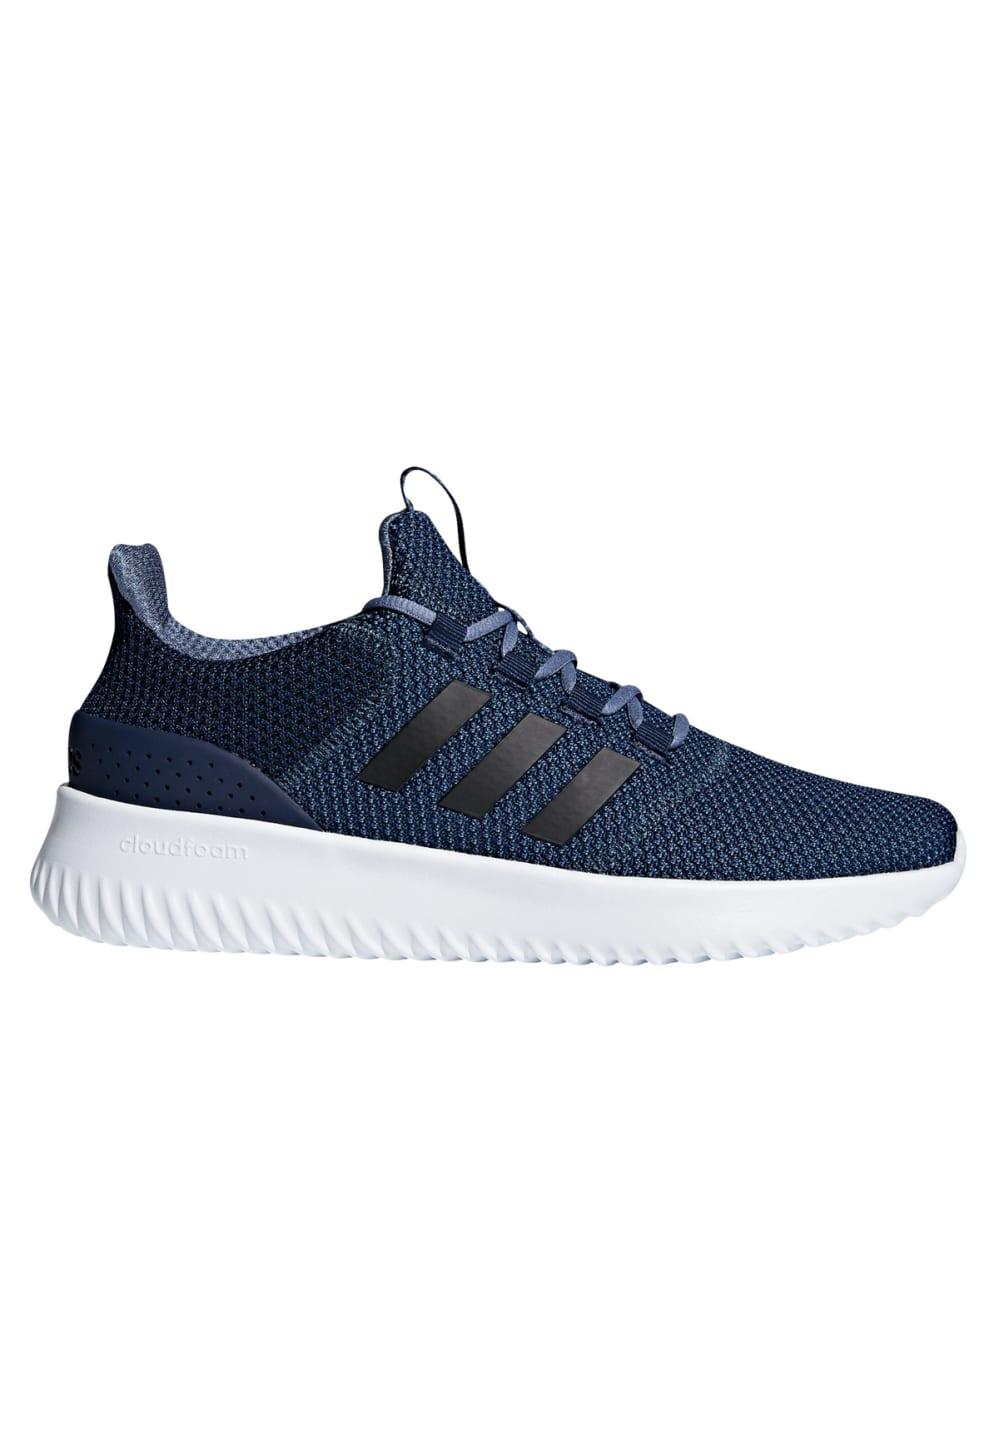 Adidas Cloudfoam Ultimate Herren Laufschuh